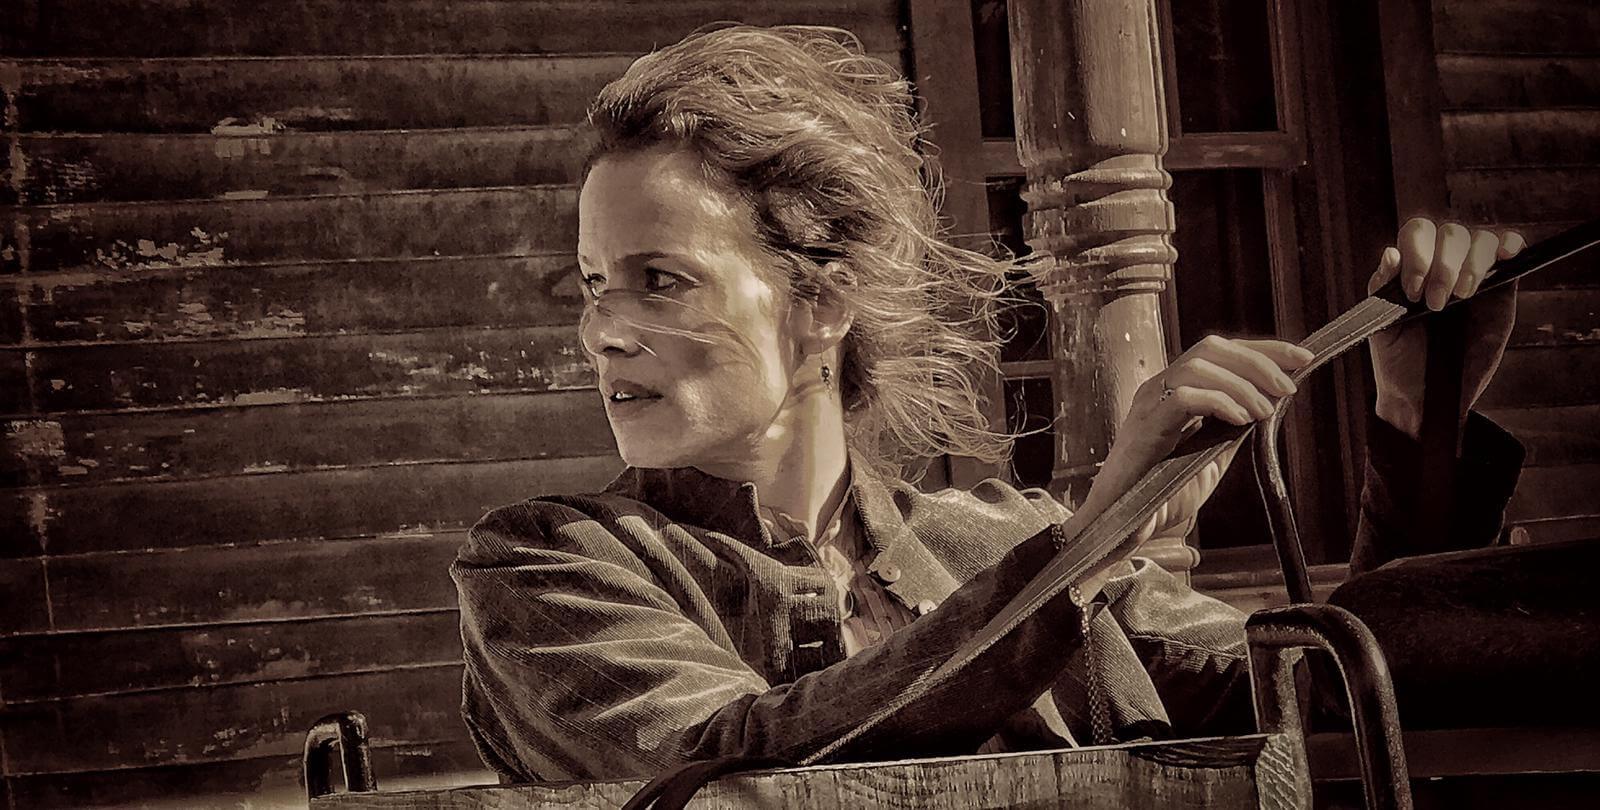 04-2019.JOSEPHINE ANGE GARDIEN 1880 WESTERN